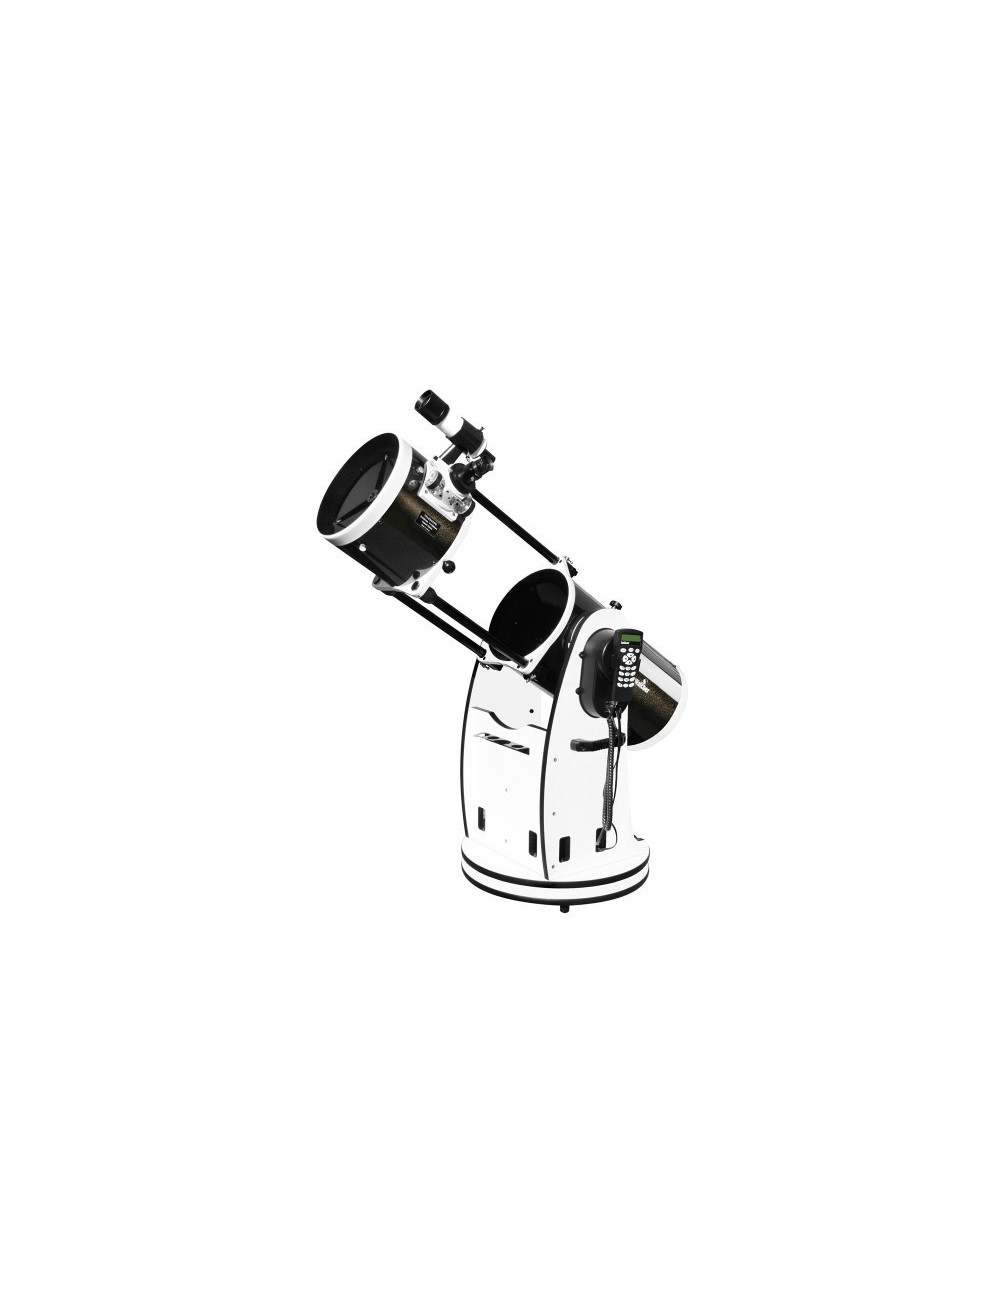 Telescope Dobson FlexTube GoTo 250/1200 Sky-Watcher